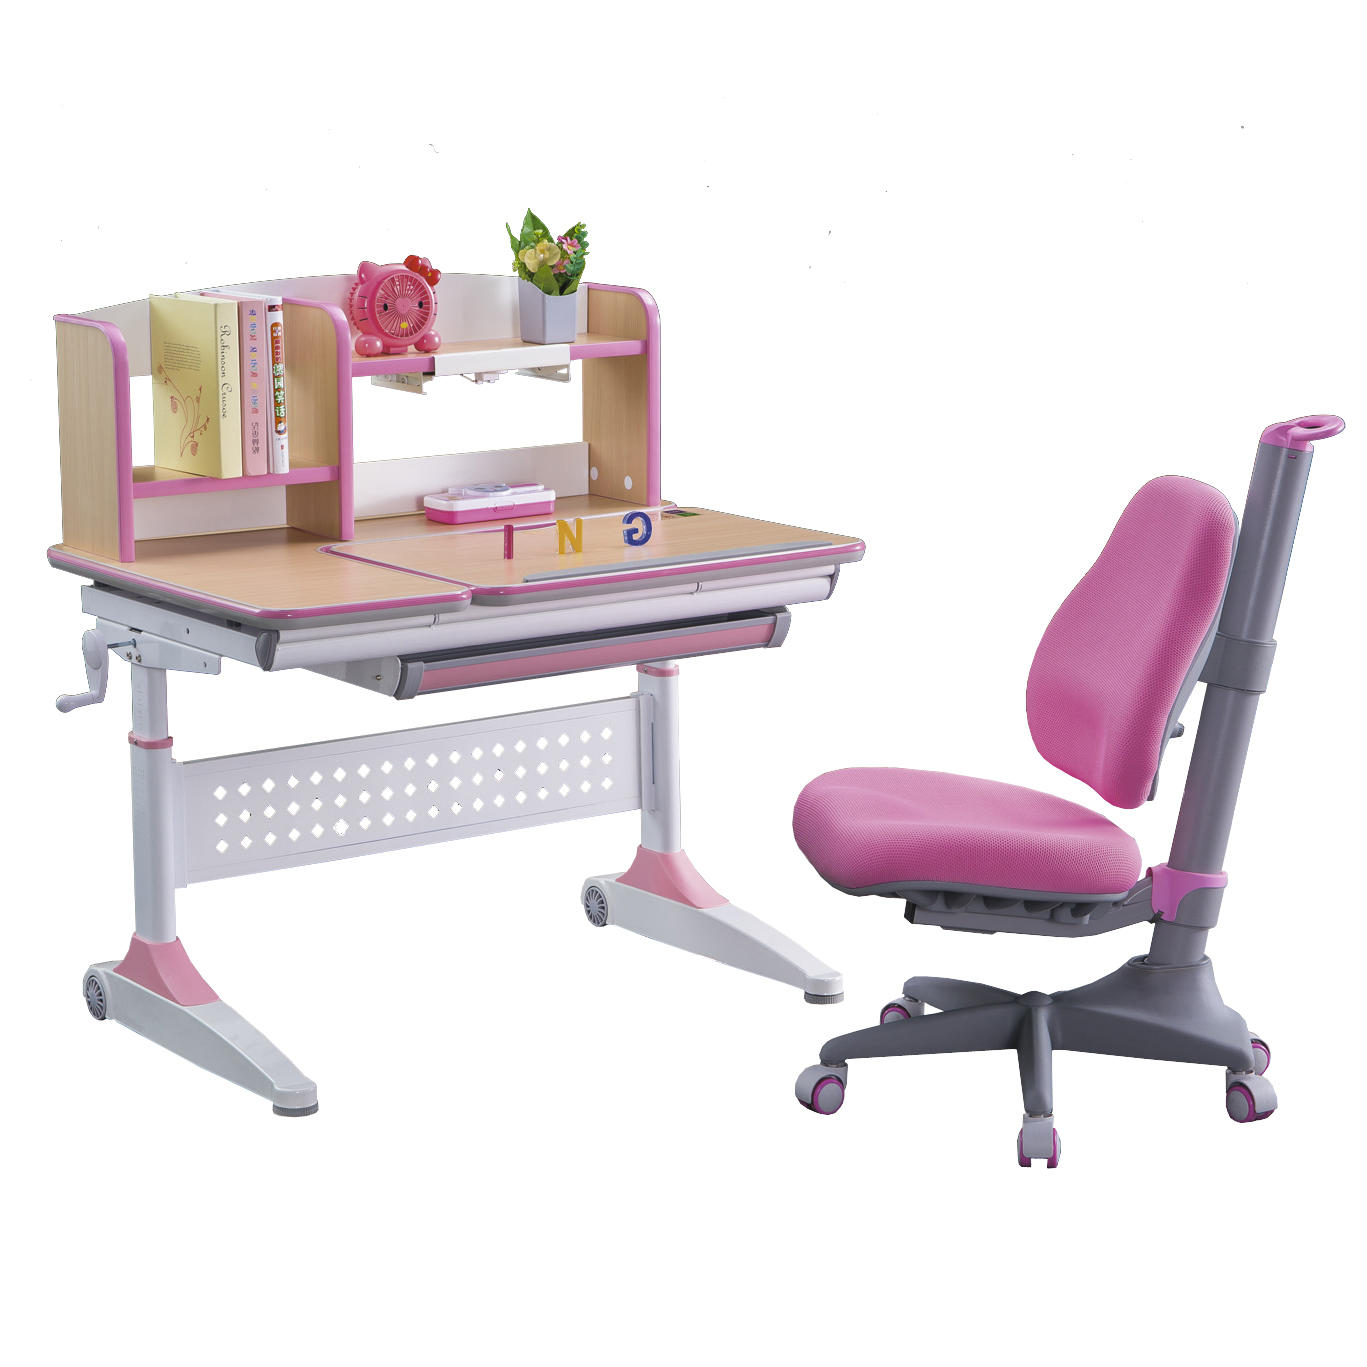 Kids study desk at home